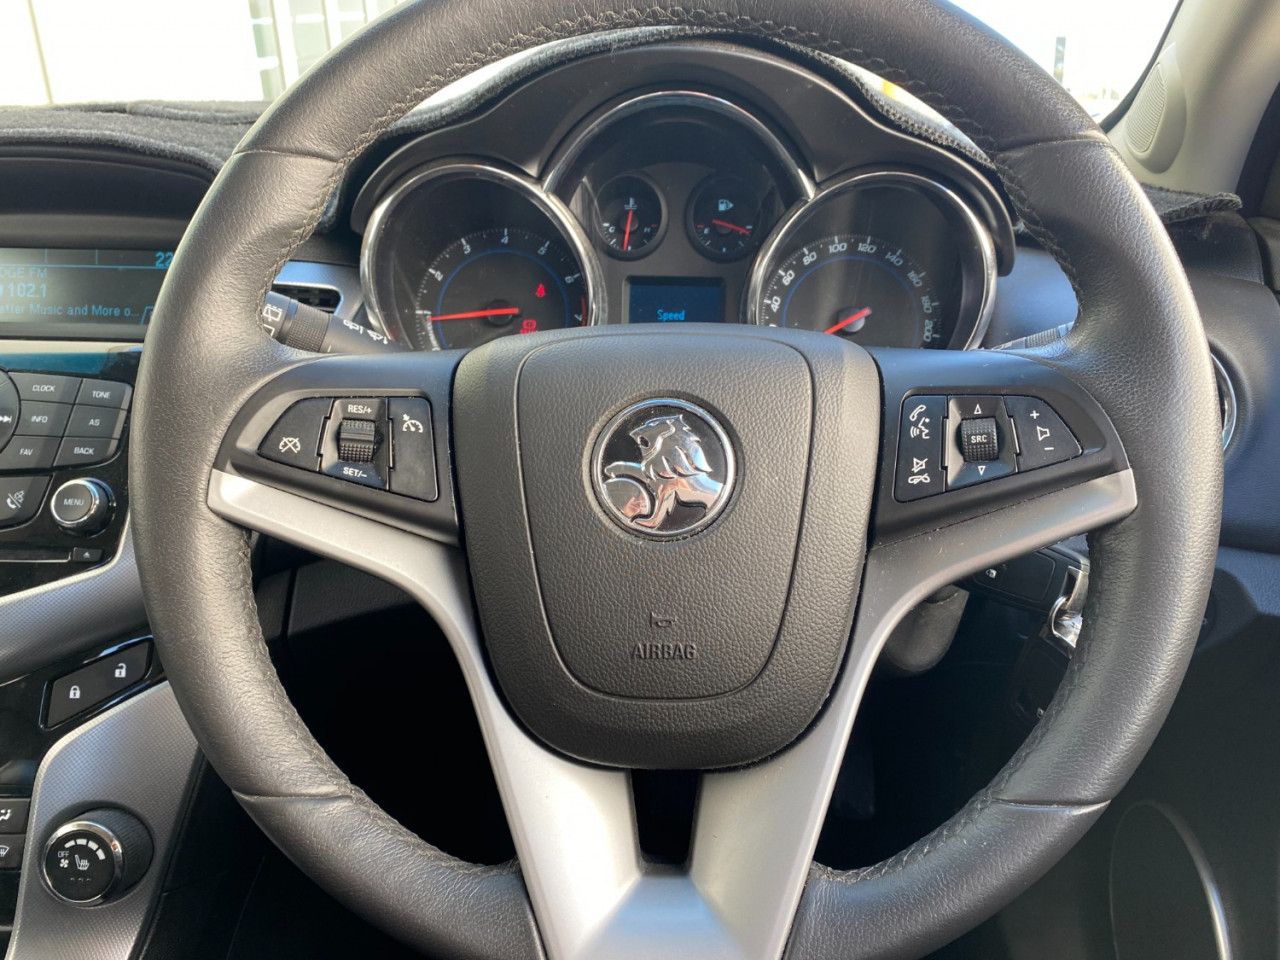 2012 Holden Cruze JH SERIES II MY12 CDX Hatchback Image 5